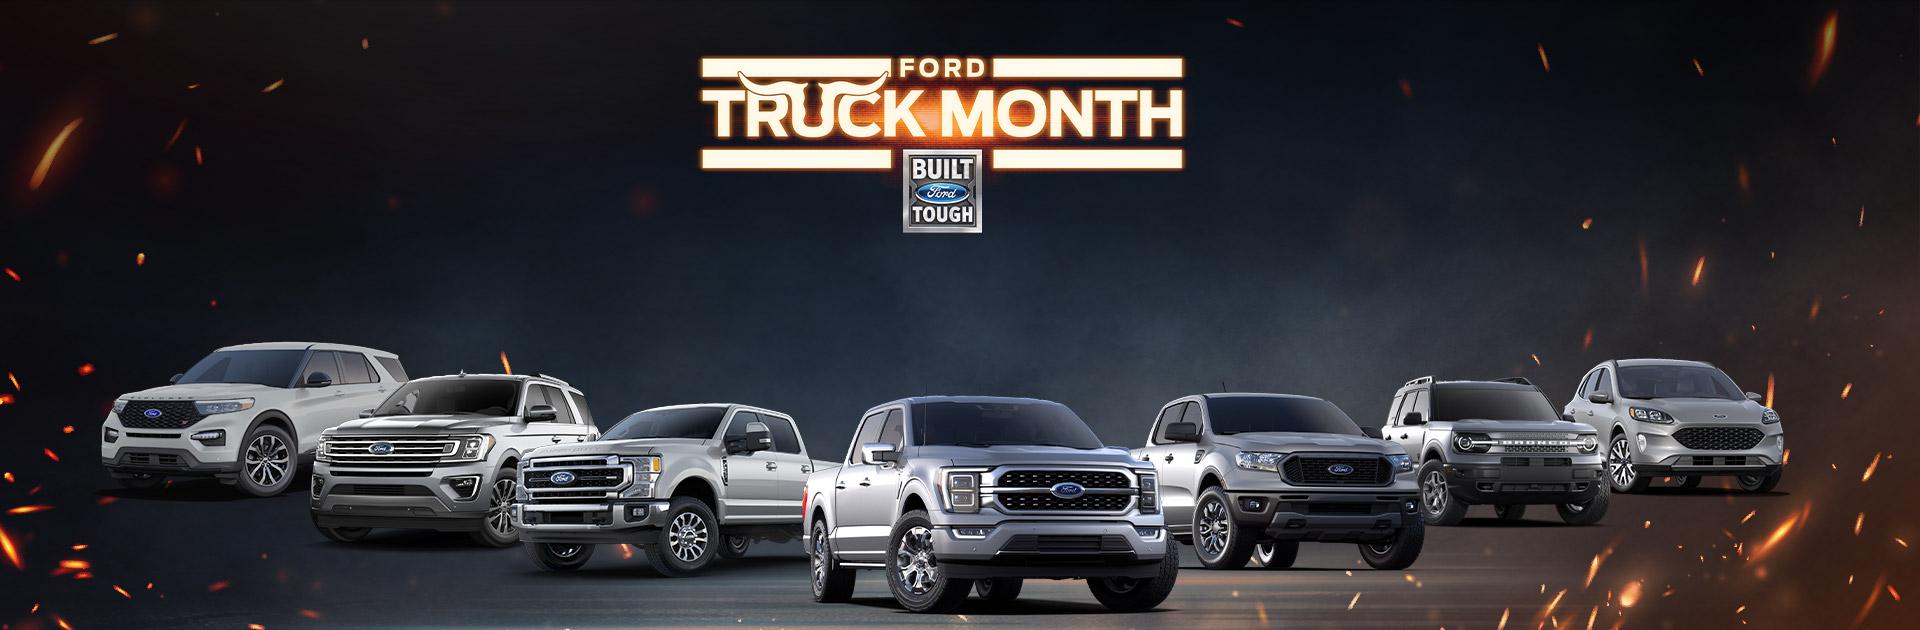 5starford Truck Month Featured